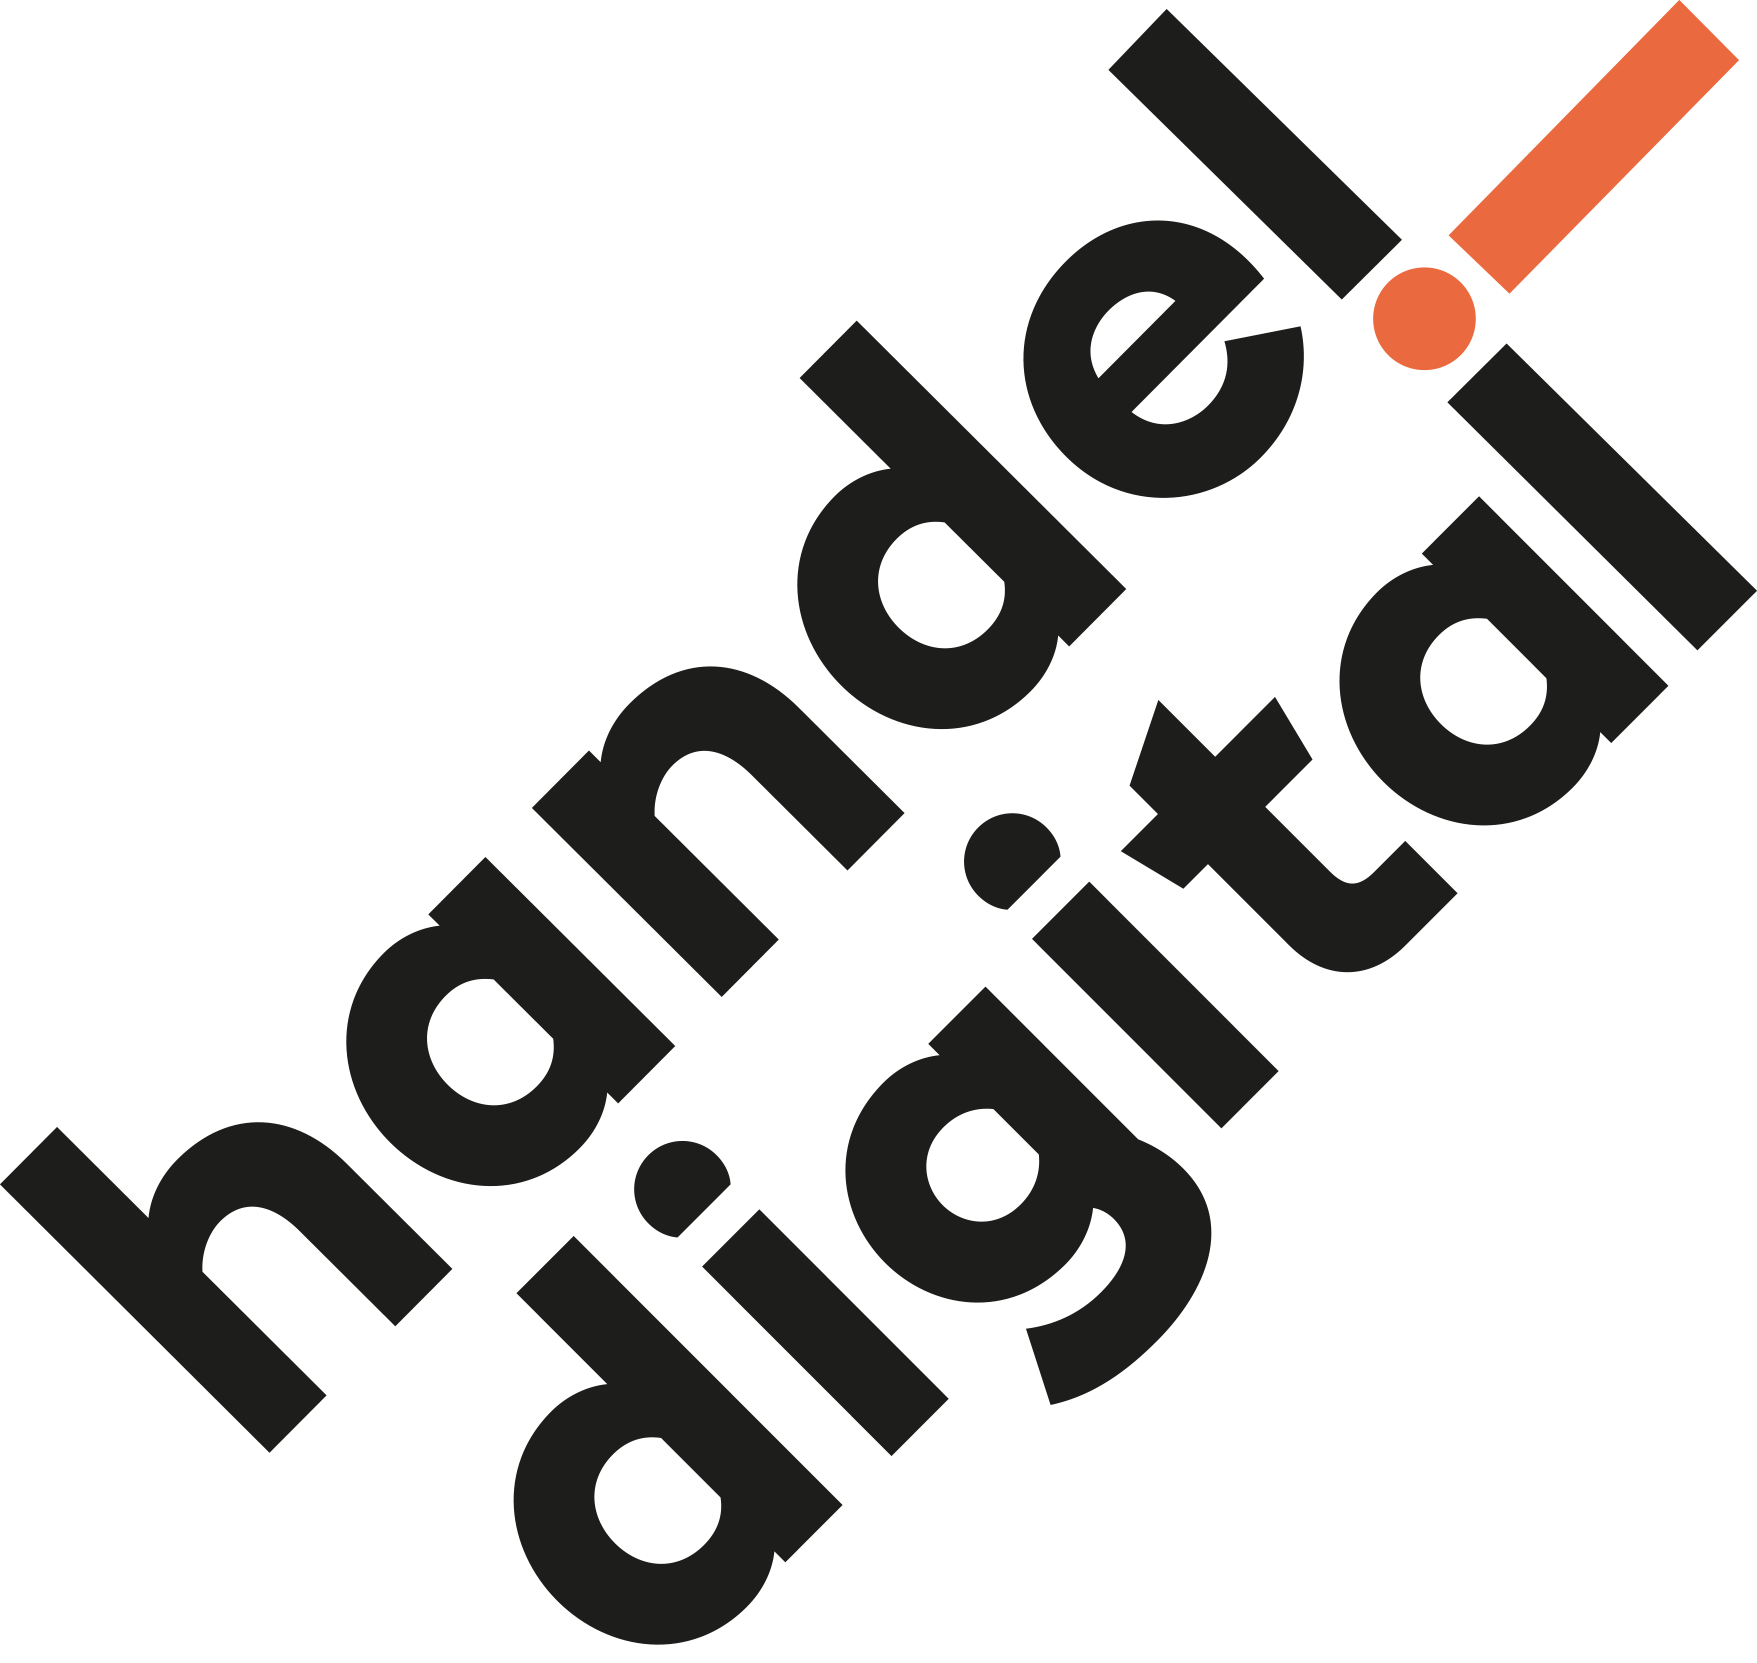 Handel Digital 2. Digi-Level der Digitalisierung